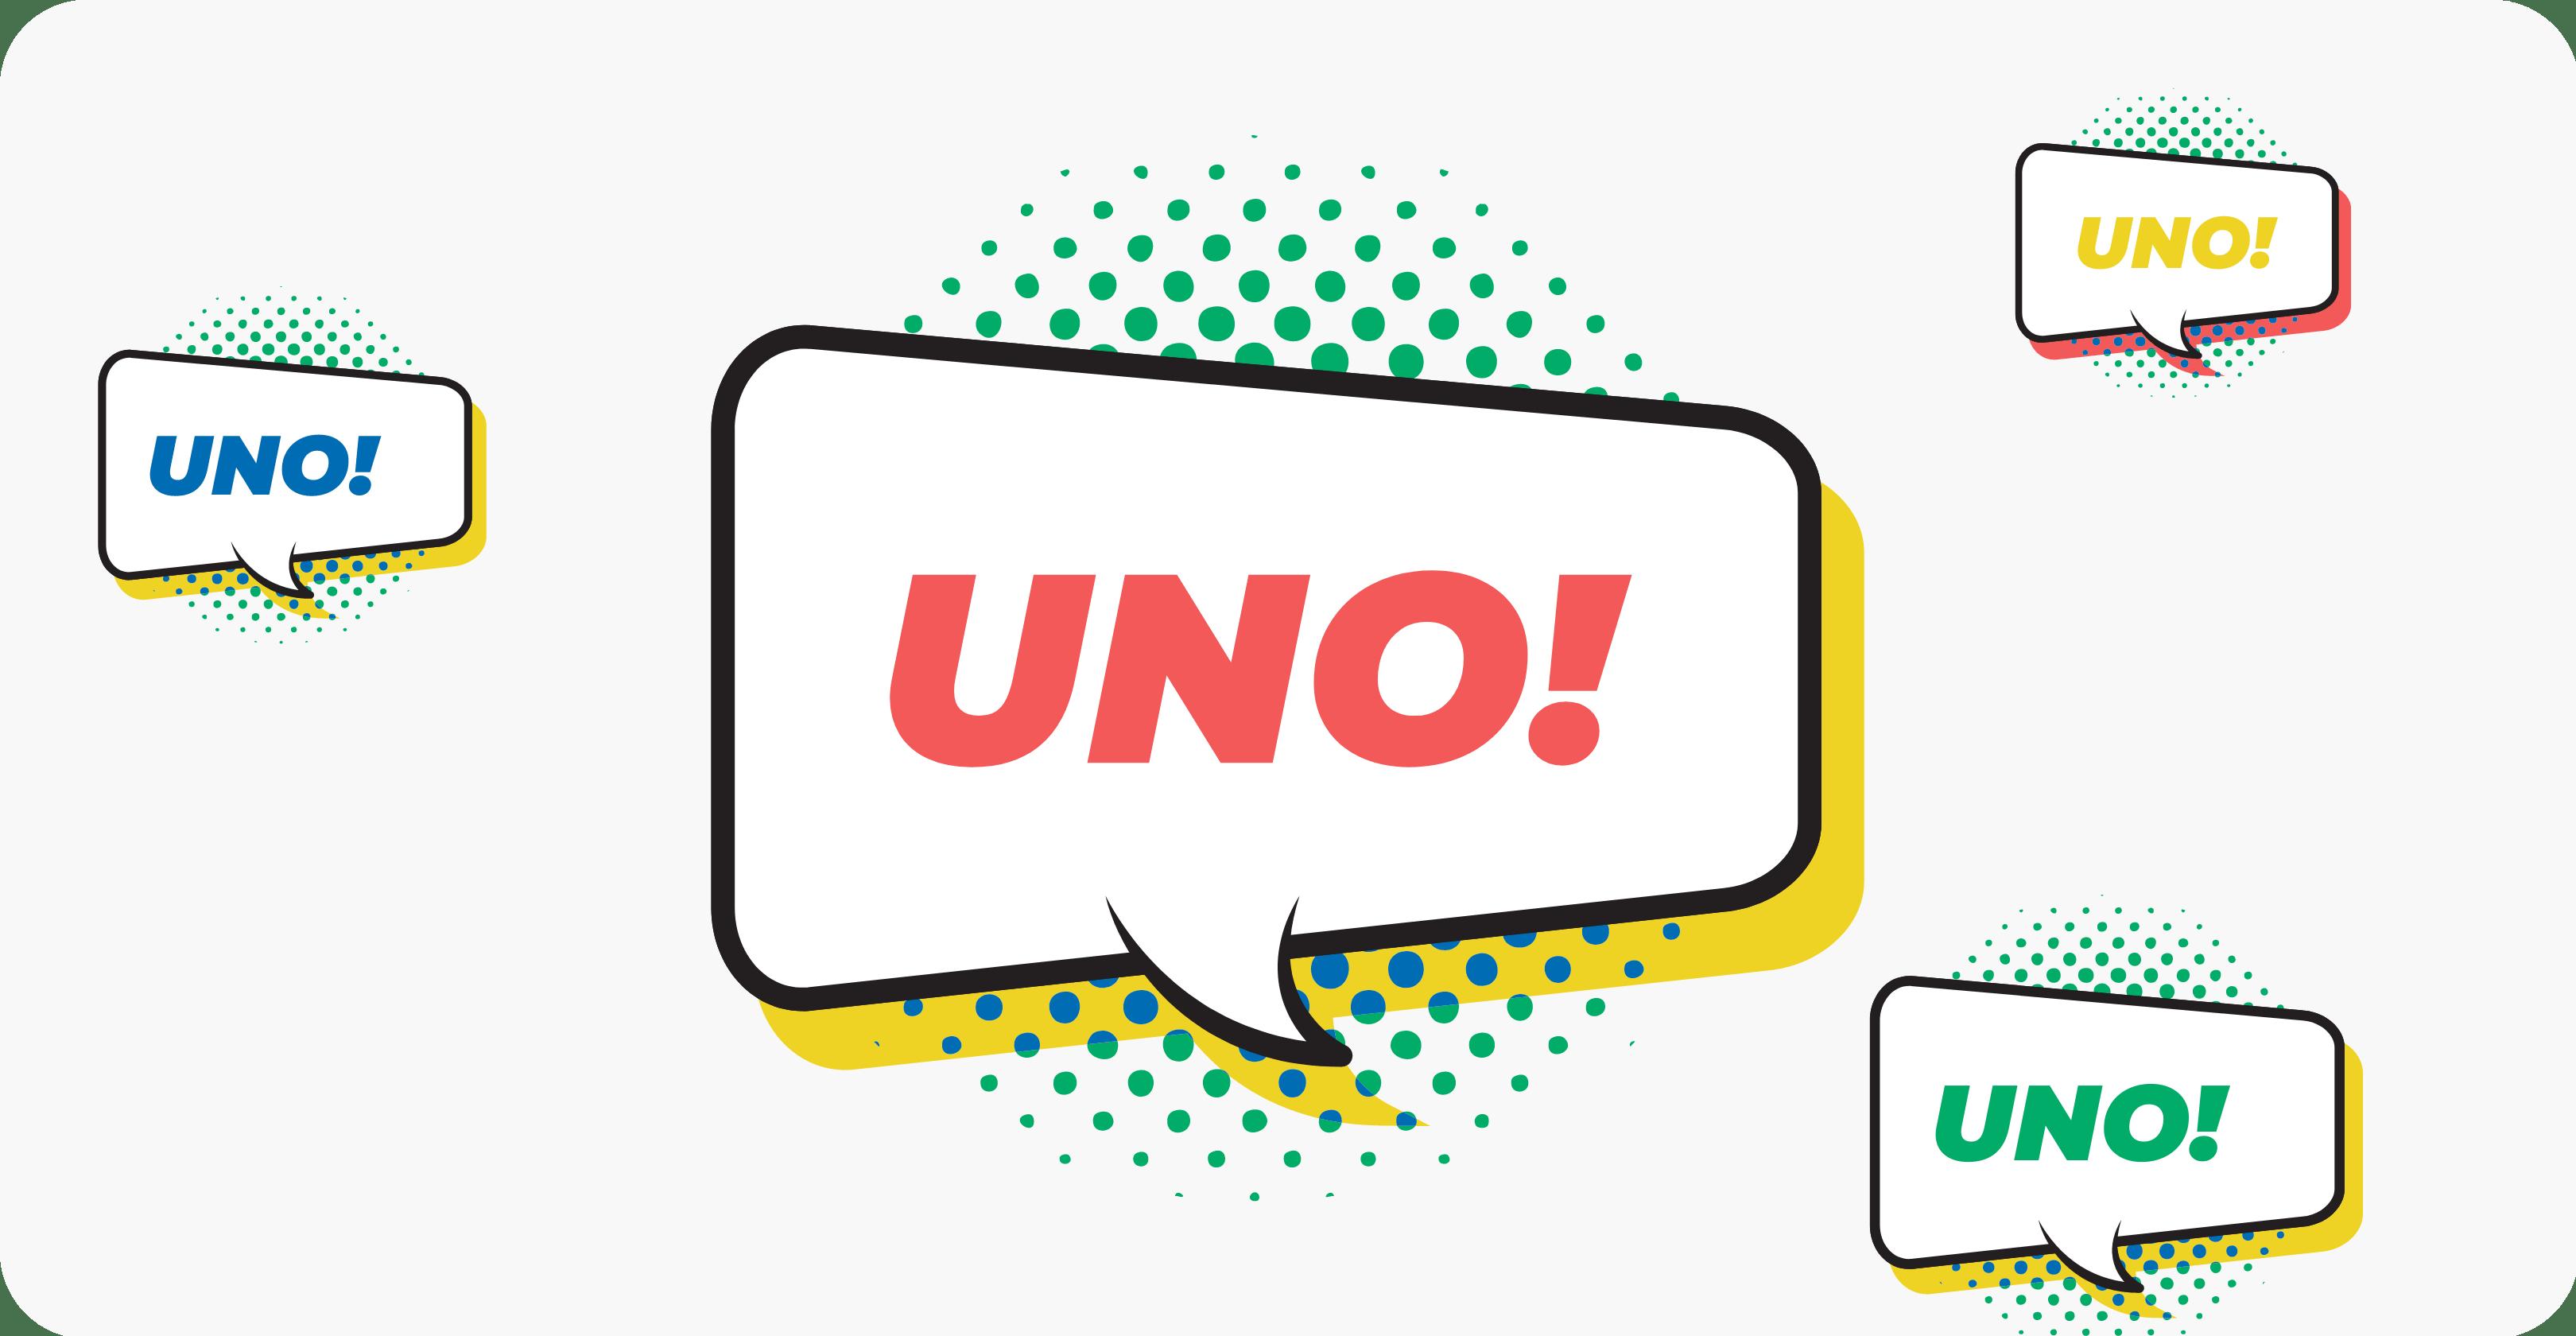 Last card - Uno!